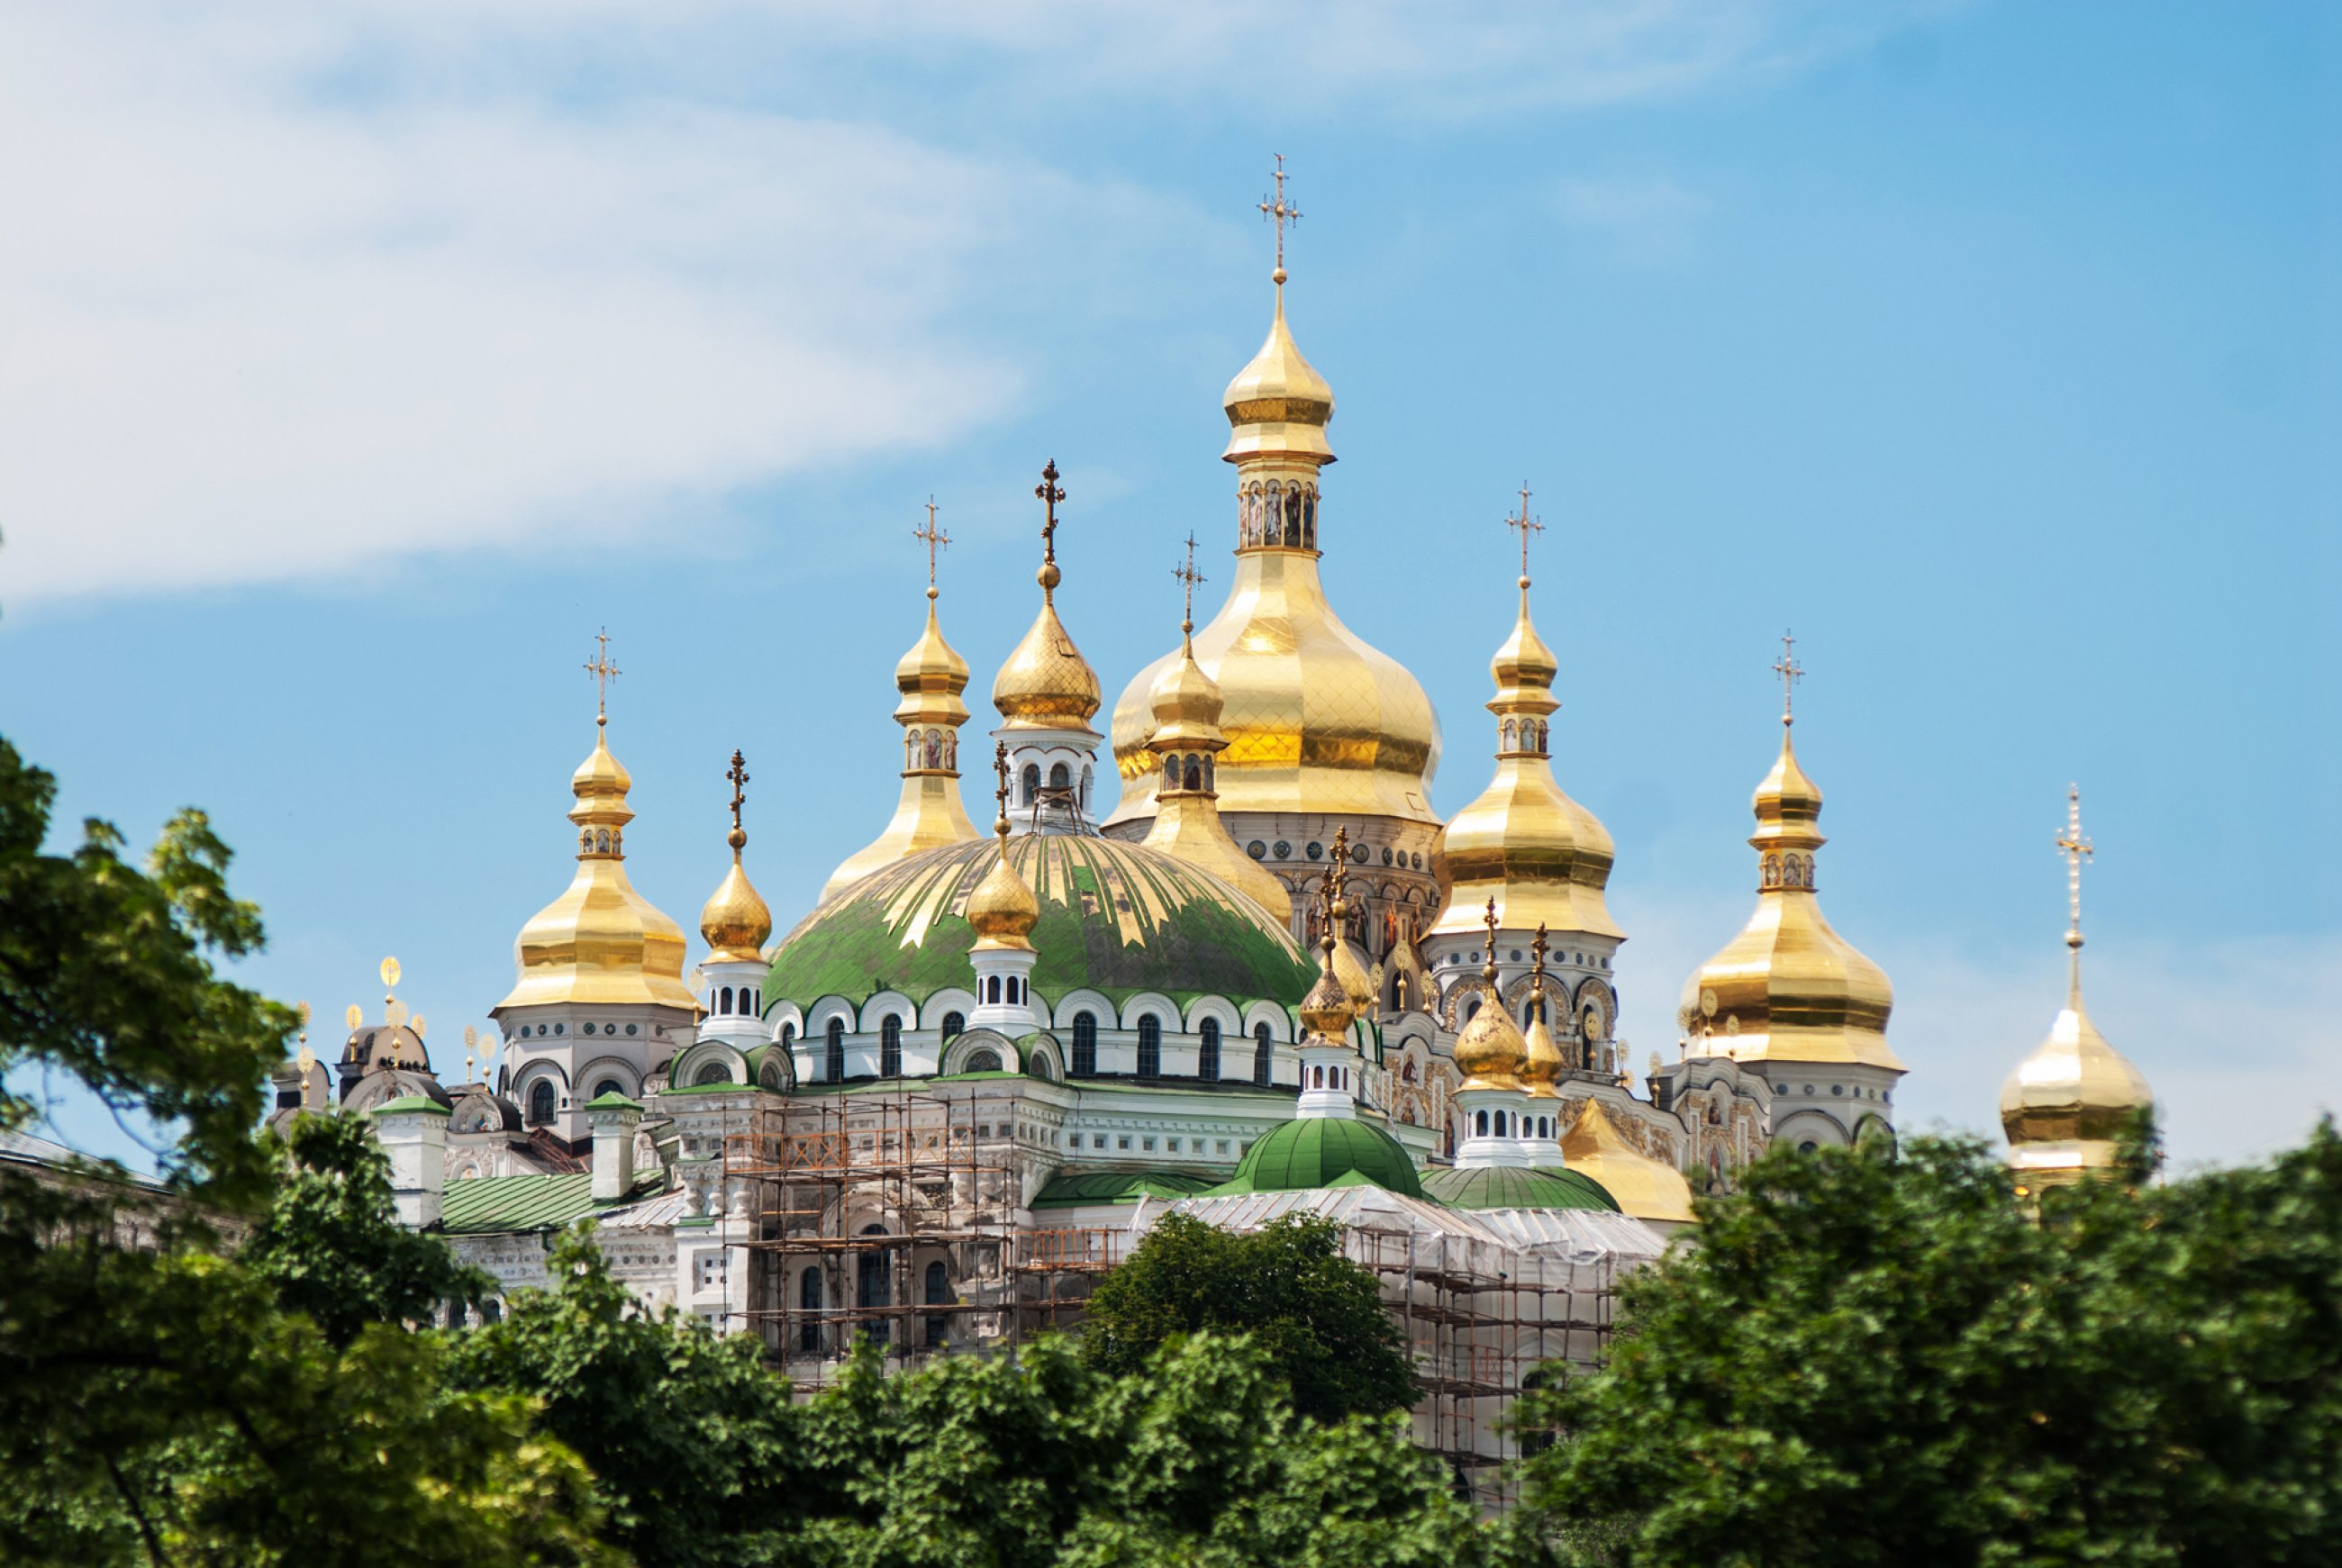 https://bubo.sk/uploads/galleries/5056/ukrajina-view-of-kiev-pechersk-lavra-the-orthodox-monastery-included-in-the-unesco-world-heritage-list-ukraine.jpg